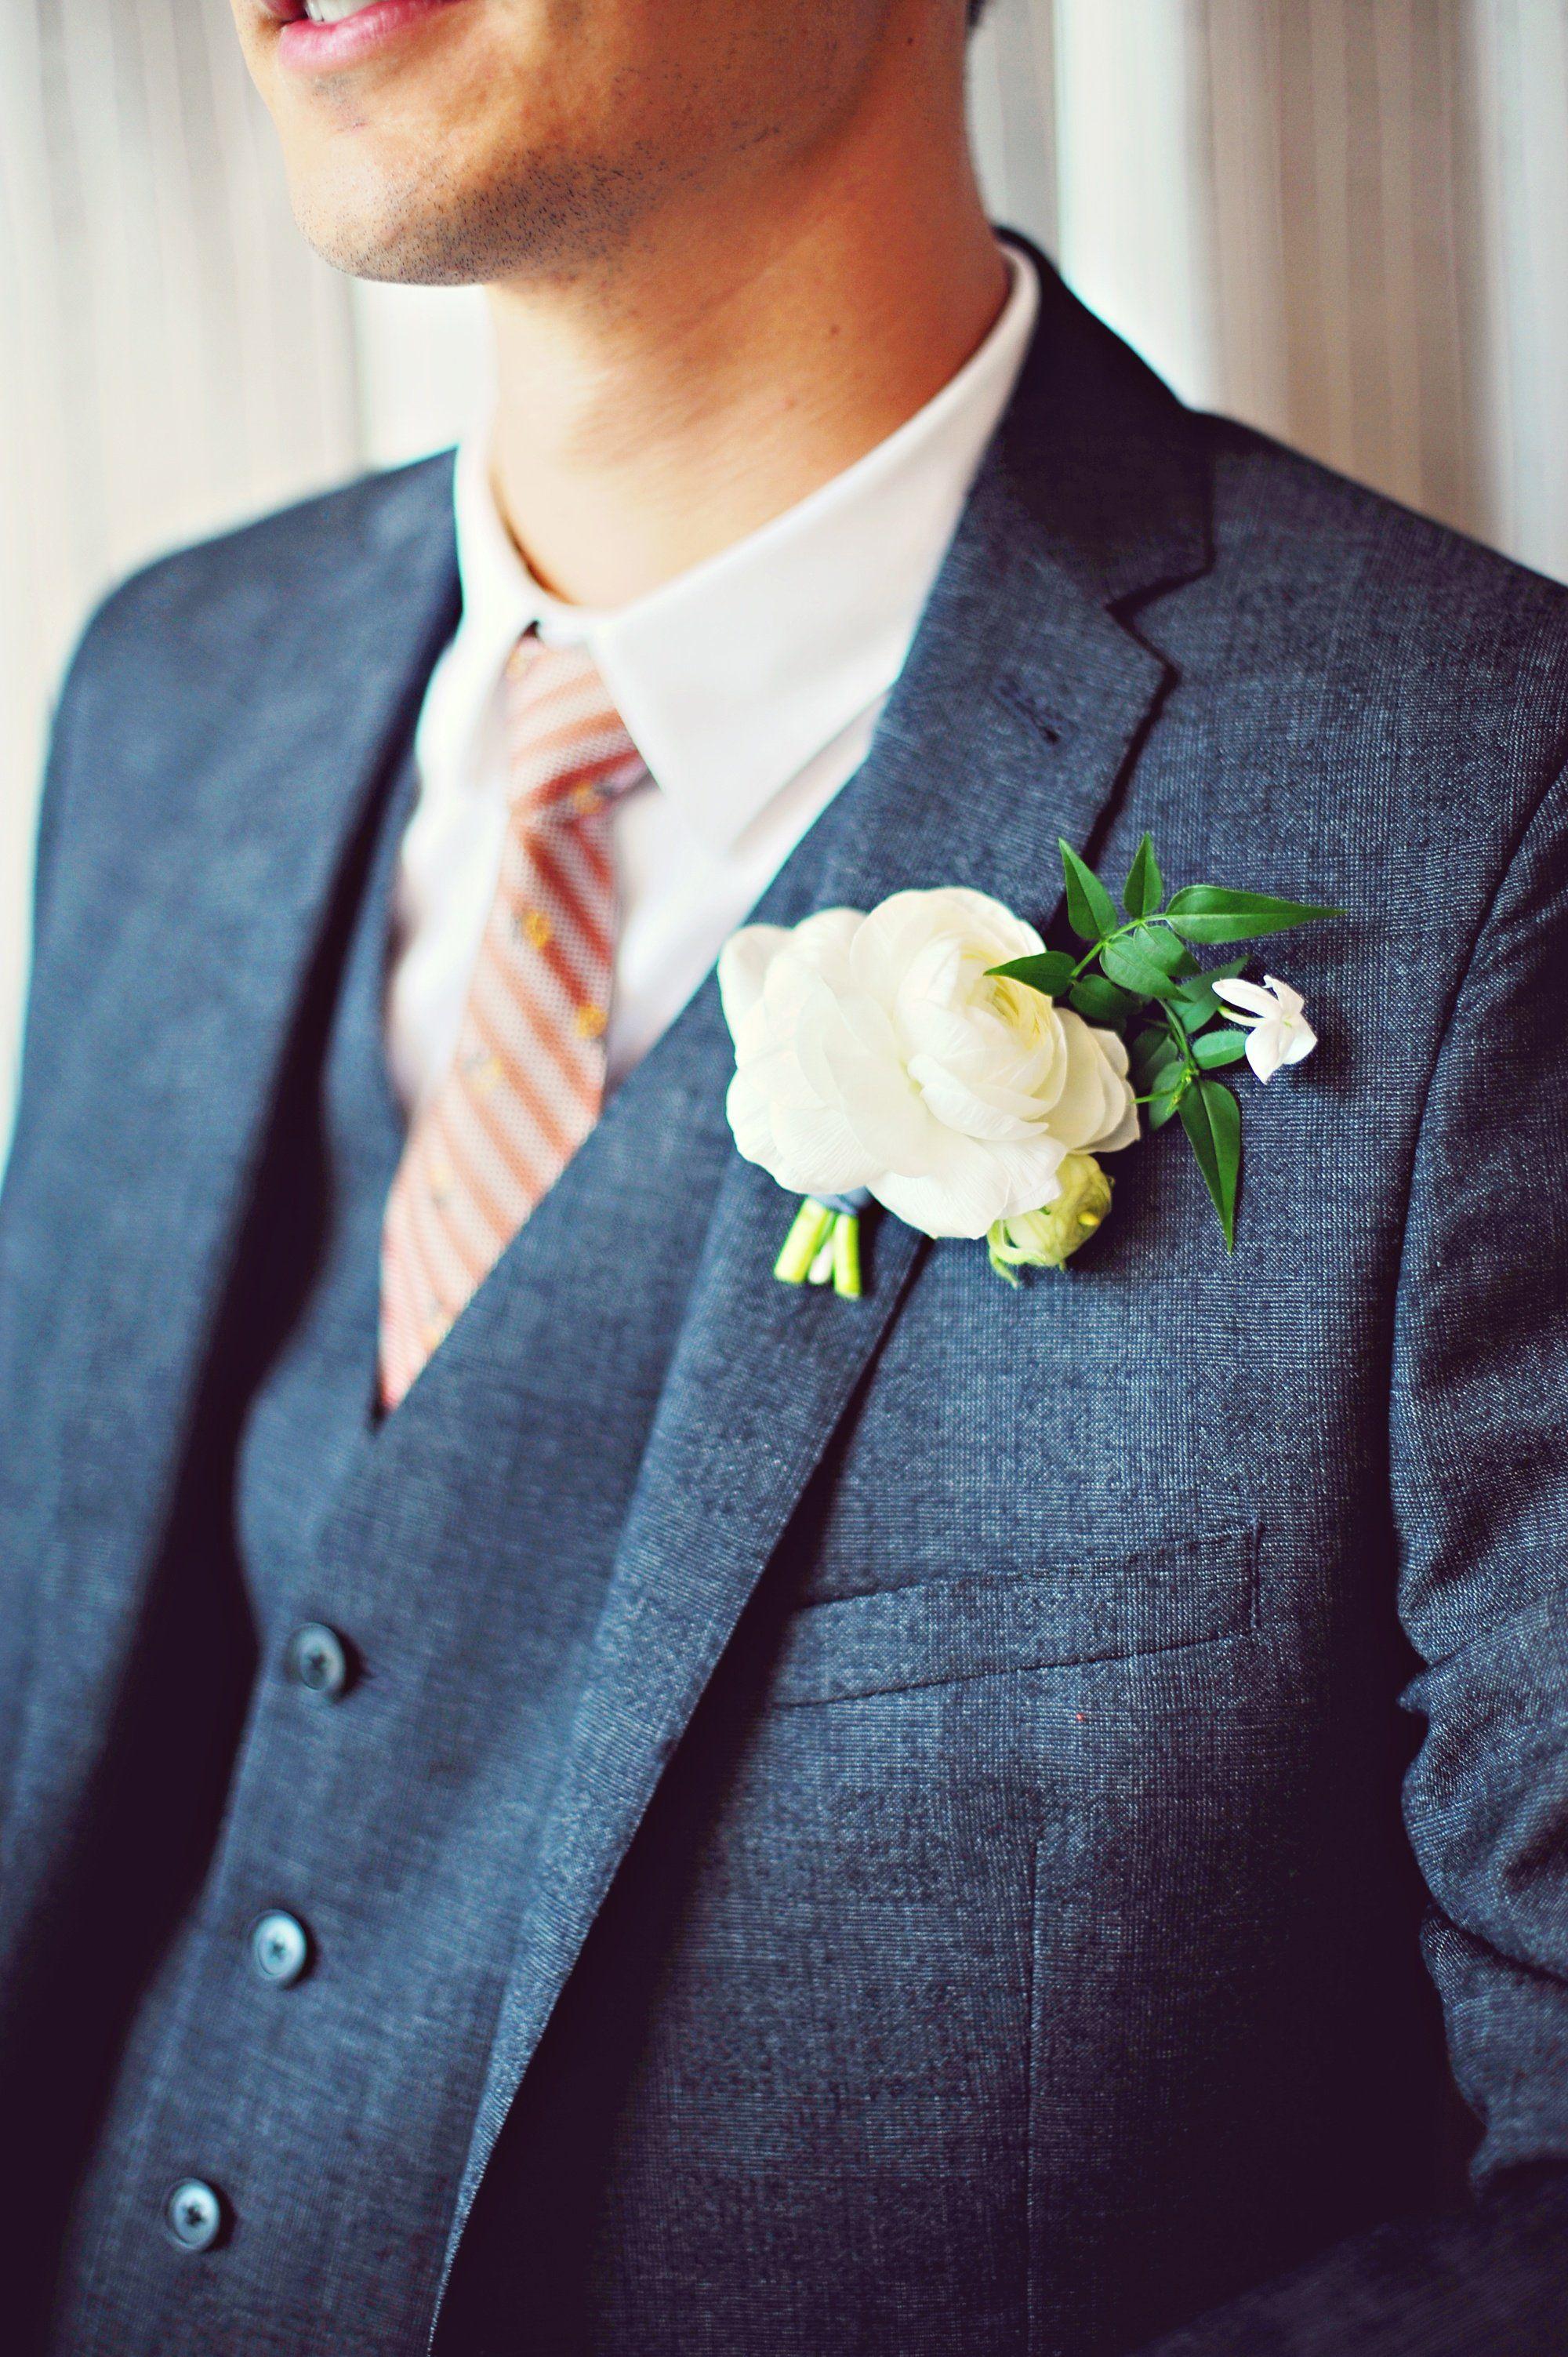 White Peony Boutonniere | Wedding time | Pinterest | Peony ...